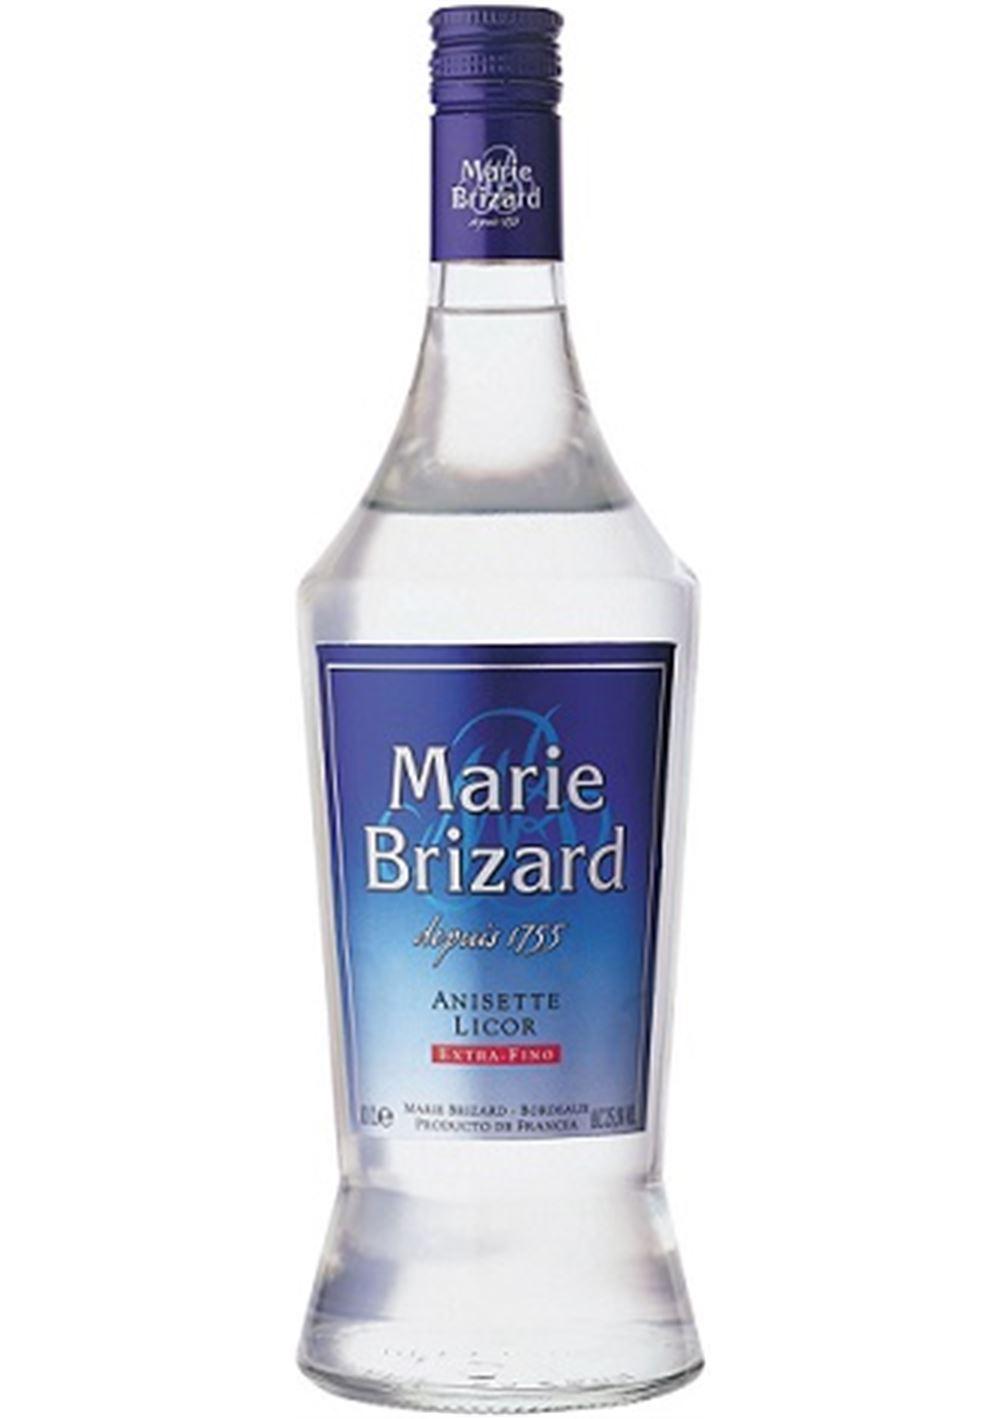 ANIS MARIA BRIZARD